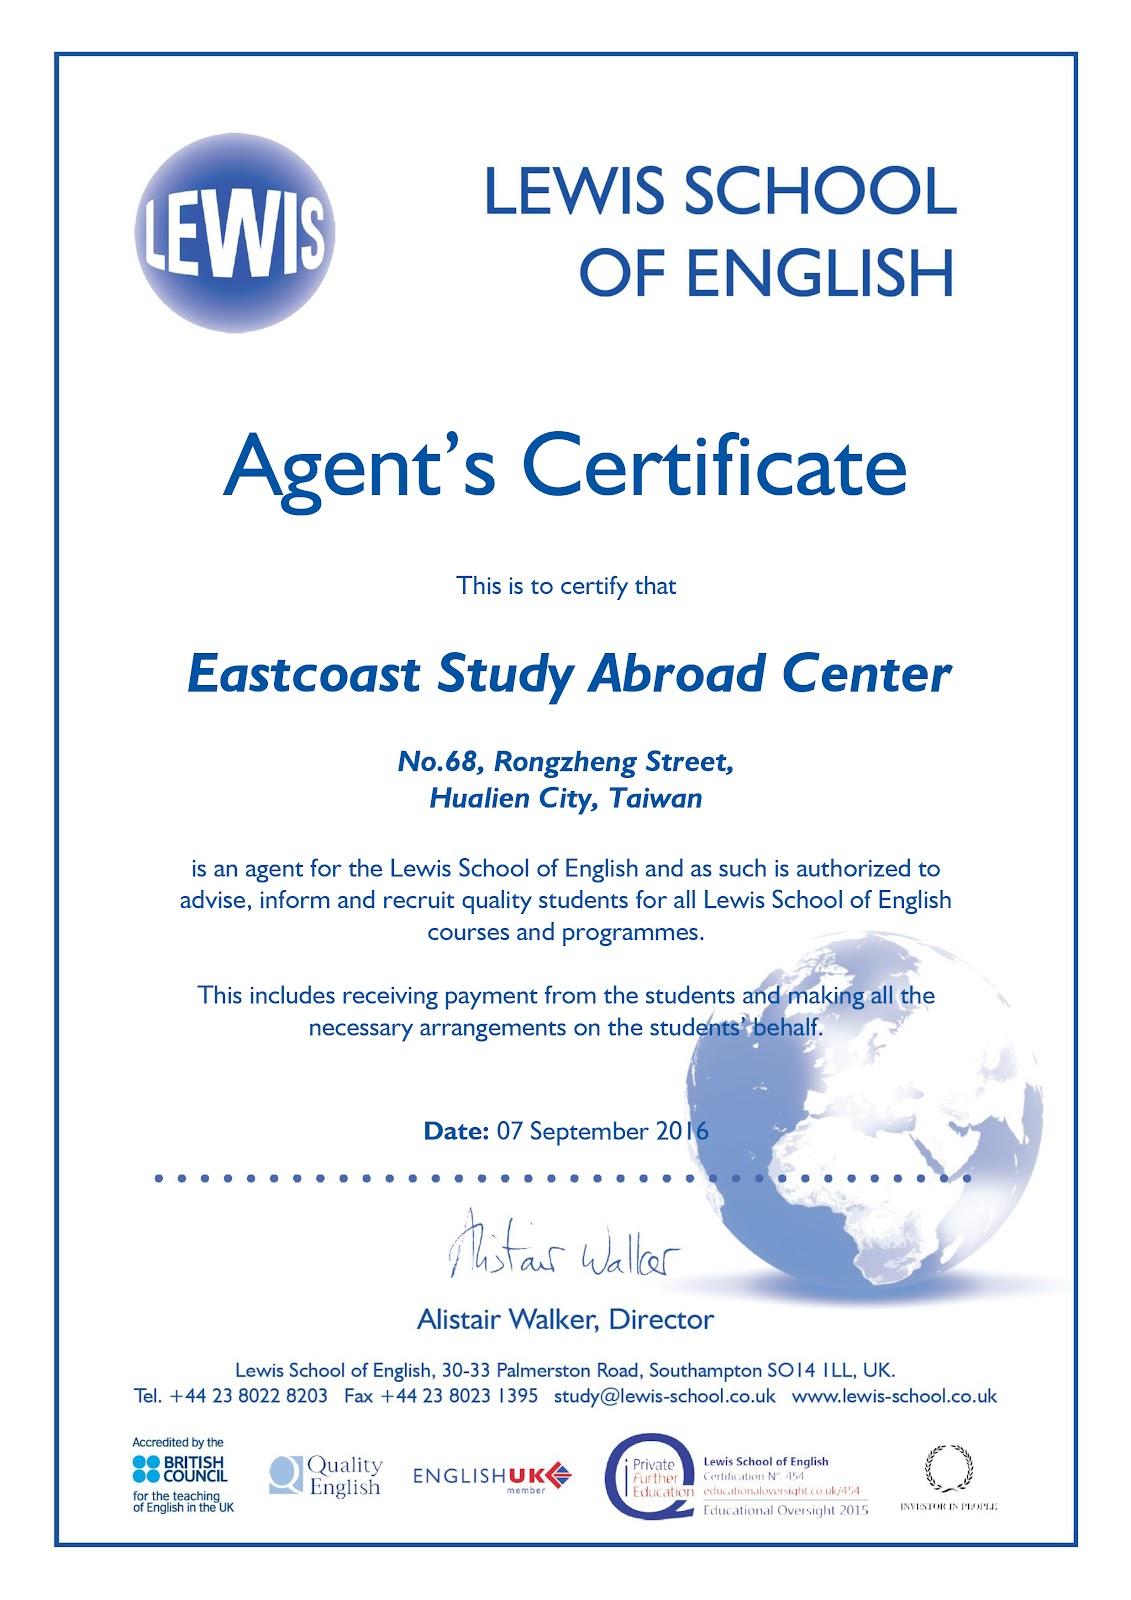 Lewis Agent Certificate.jpg